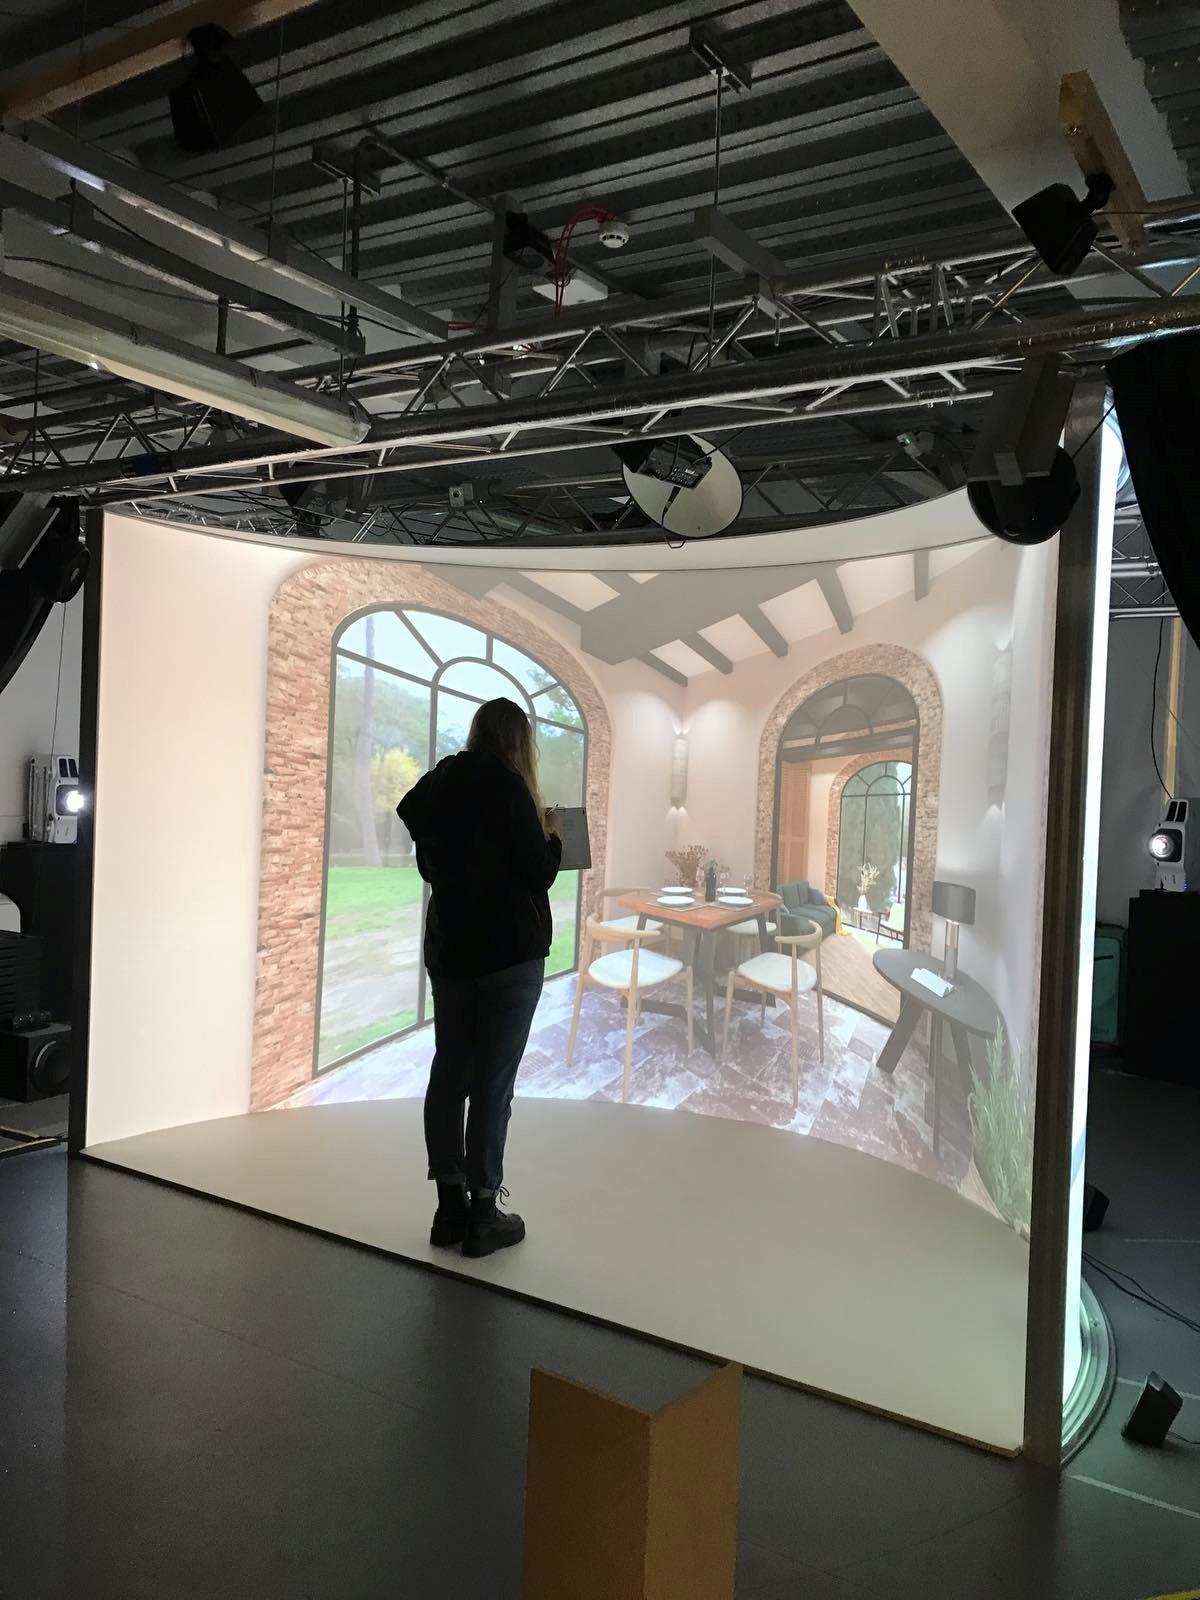 The Perceptual Experience Lab (PEL) at Cardiff School of Art & Design